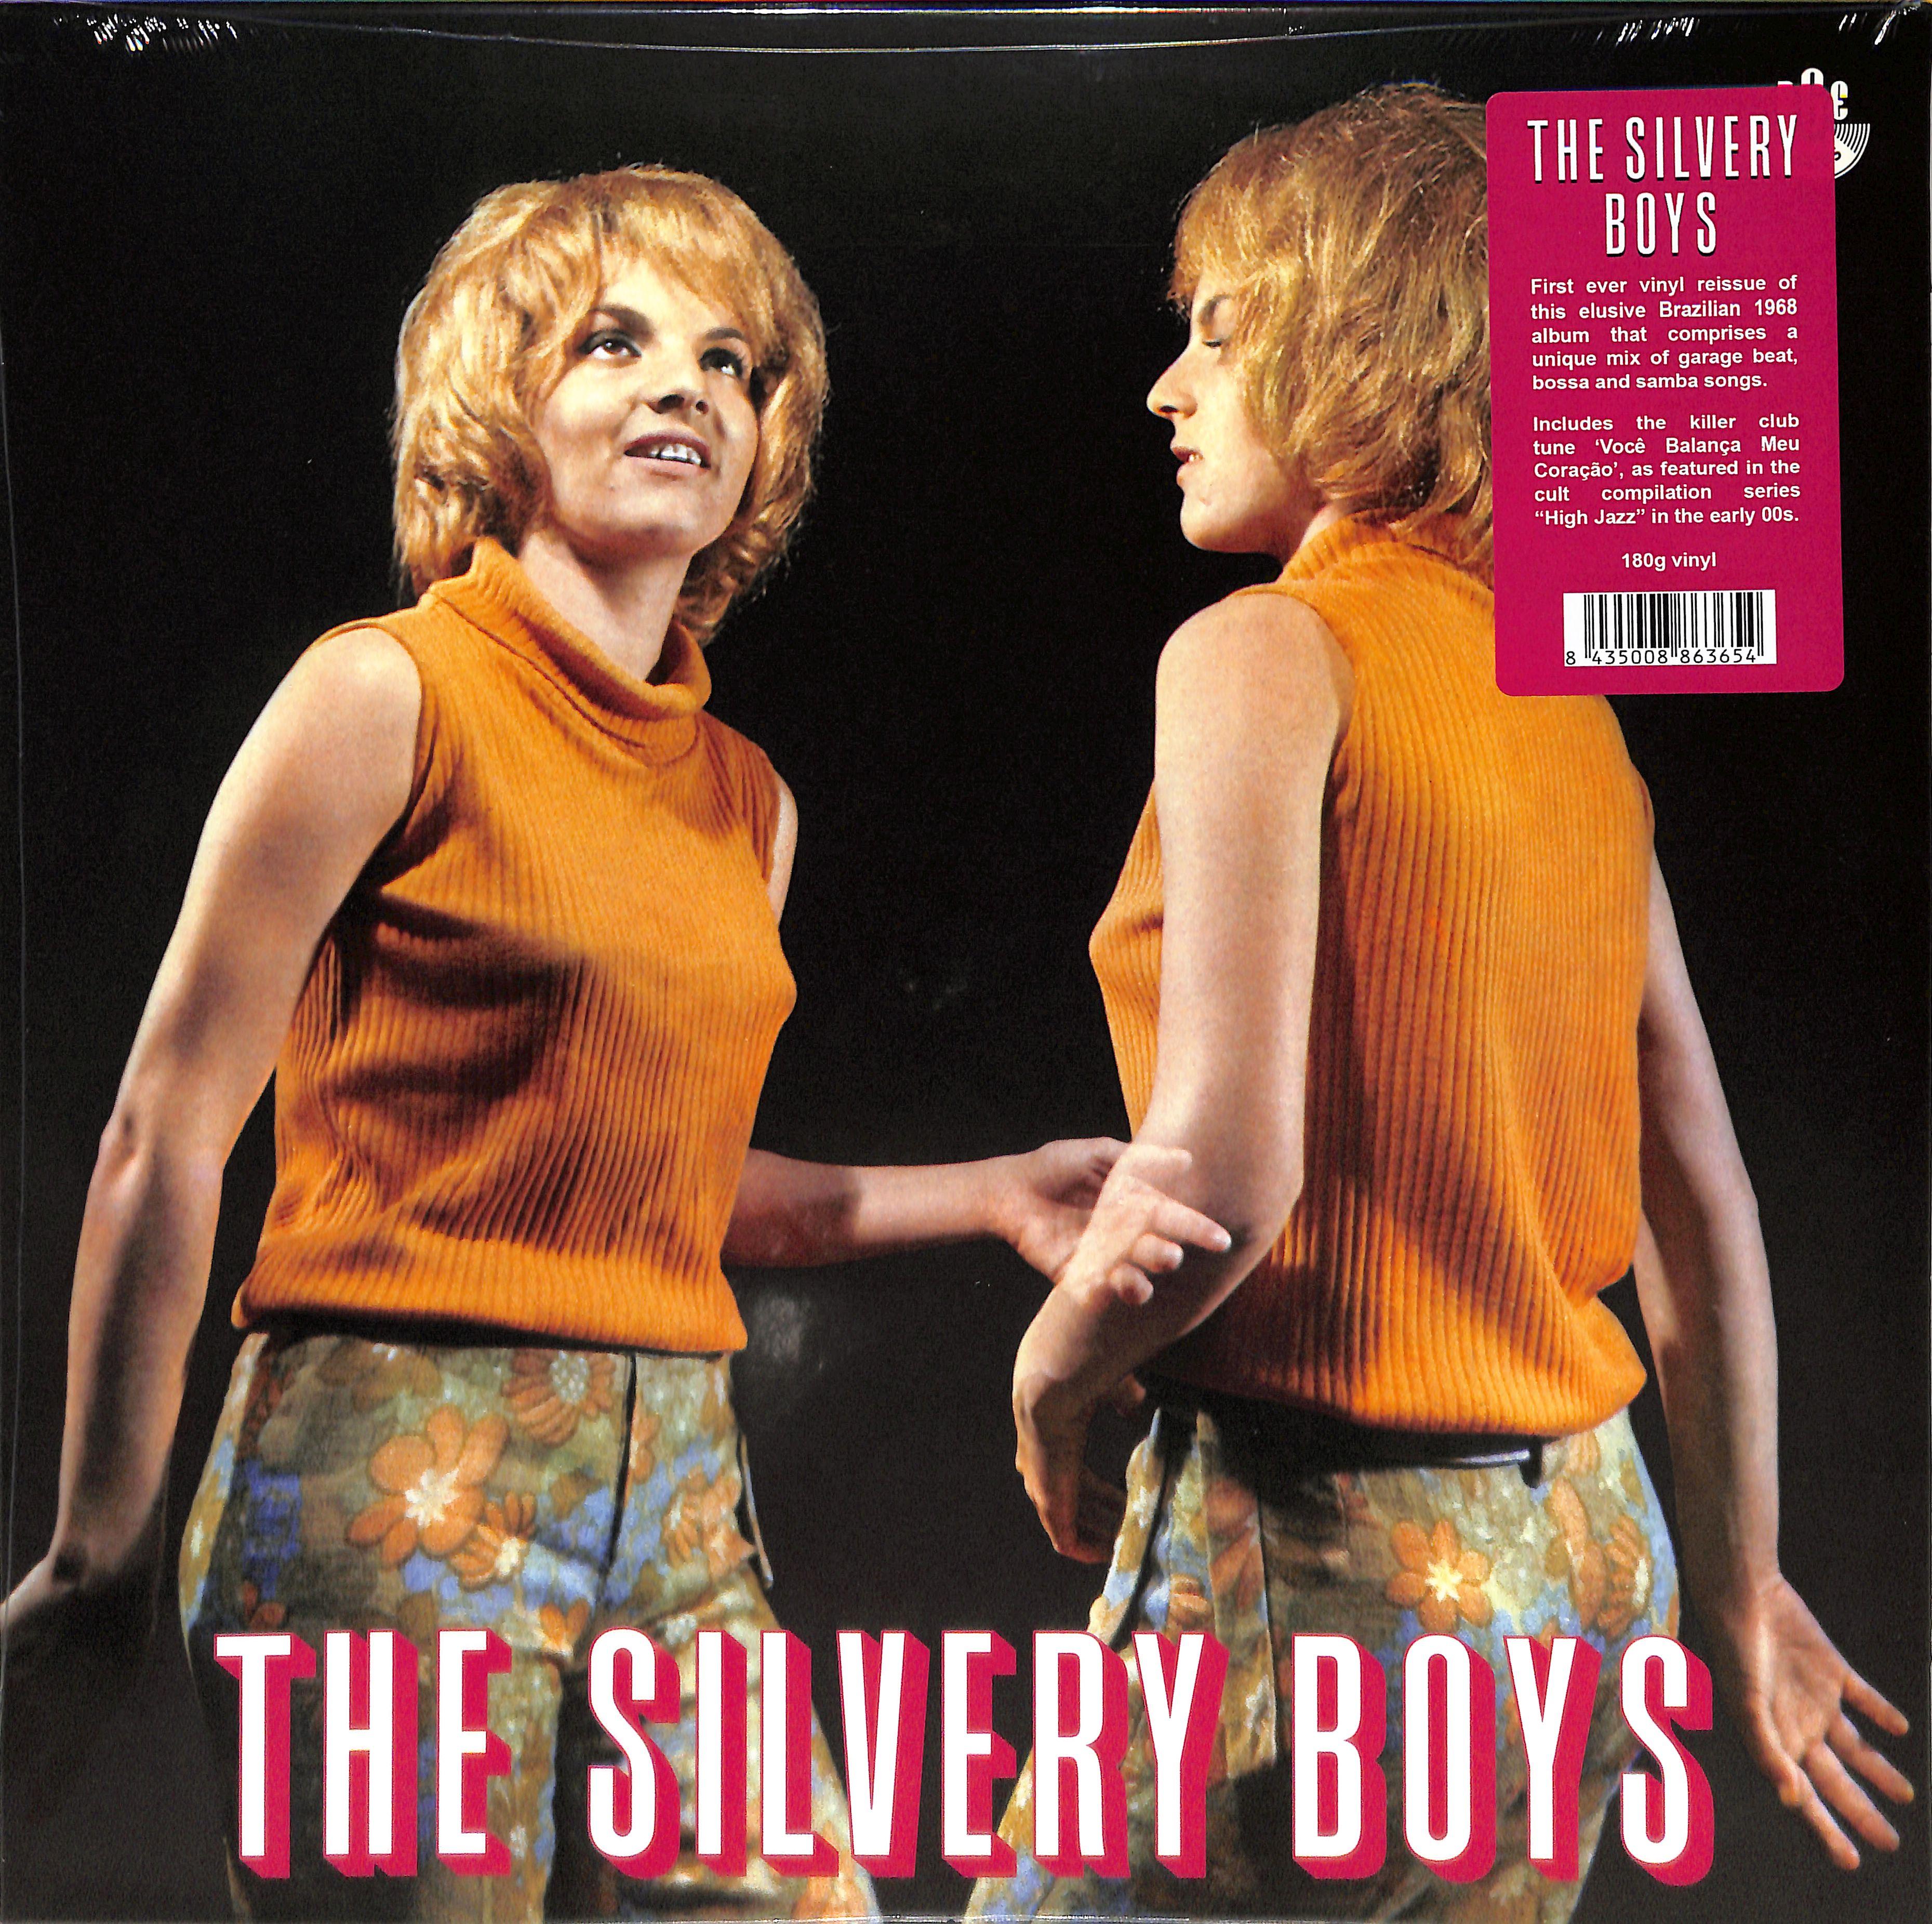 The Silvery Boys - THE SILVERY BOYS